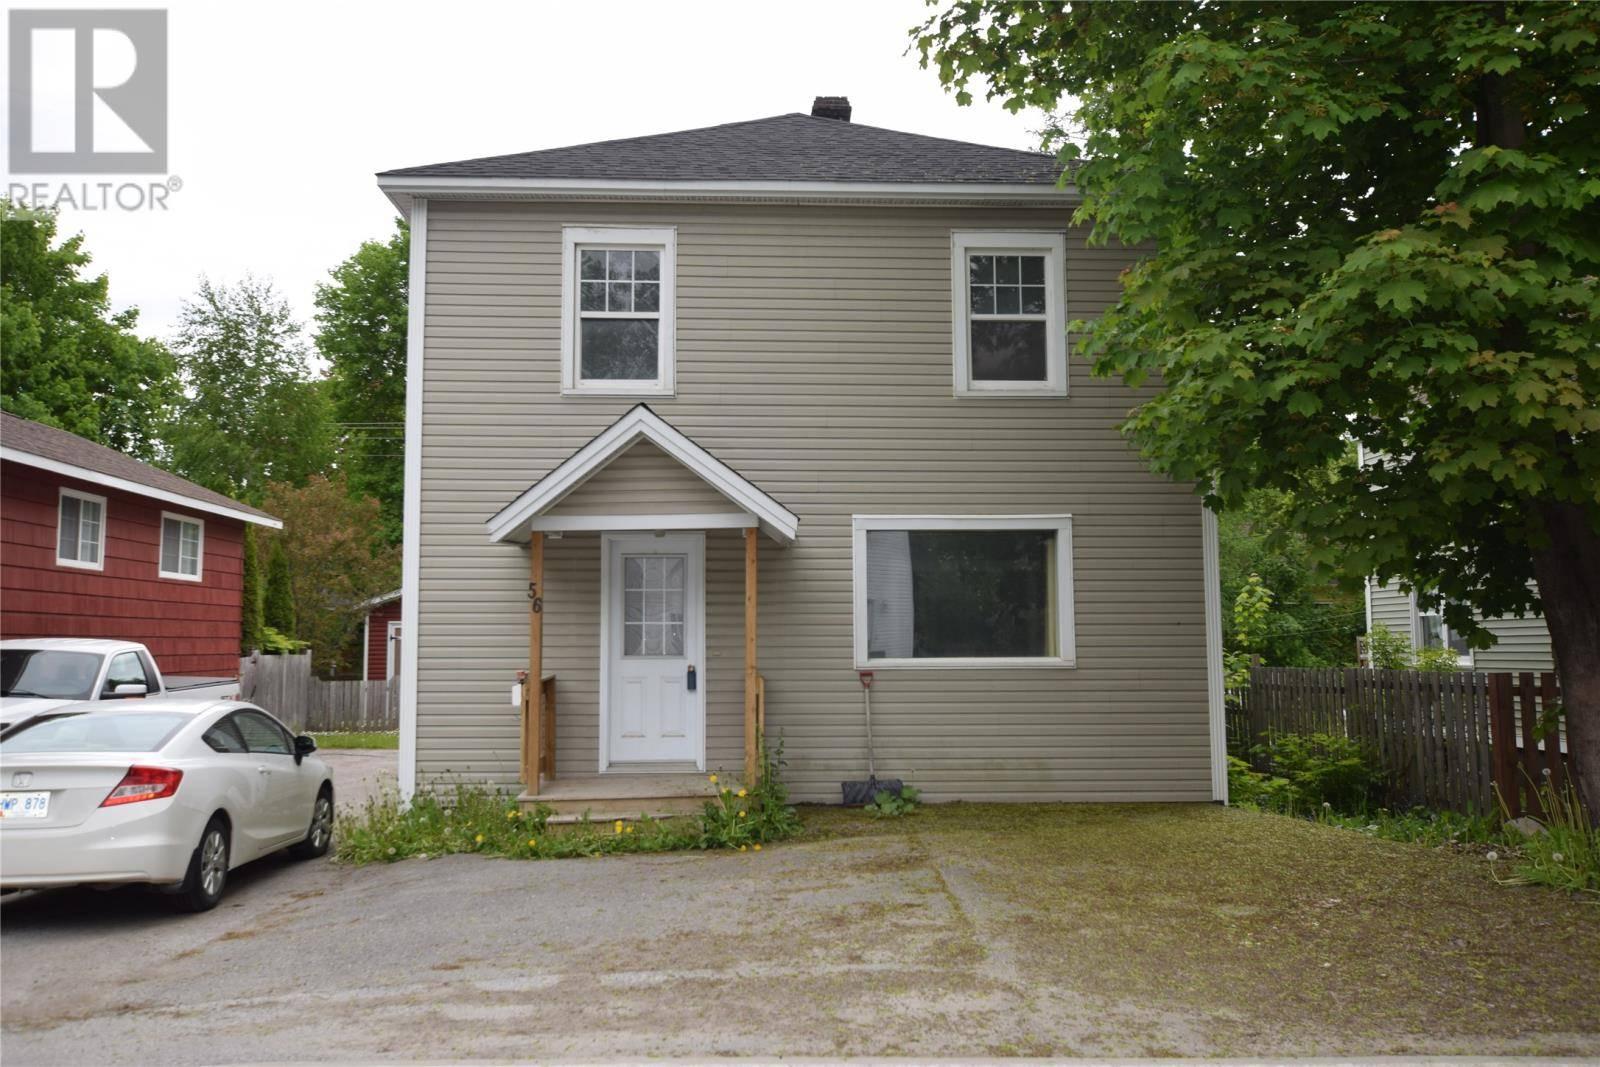 House for sale at 56 West Valley Rd Corner Brook Newfoundland - MLS: 1199389